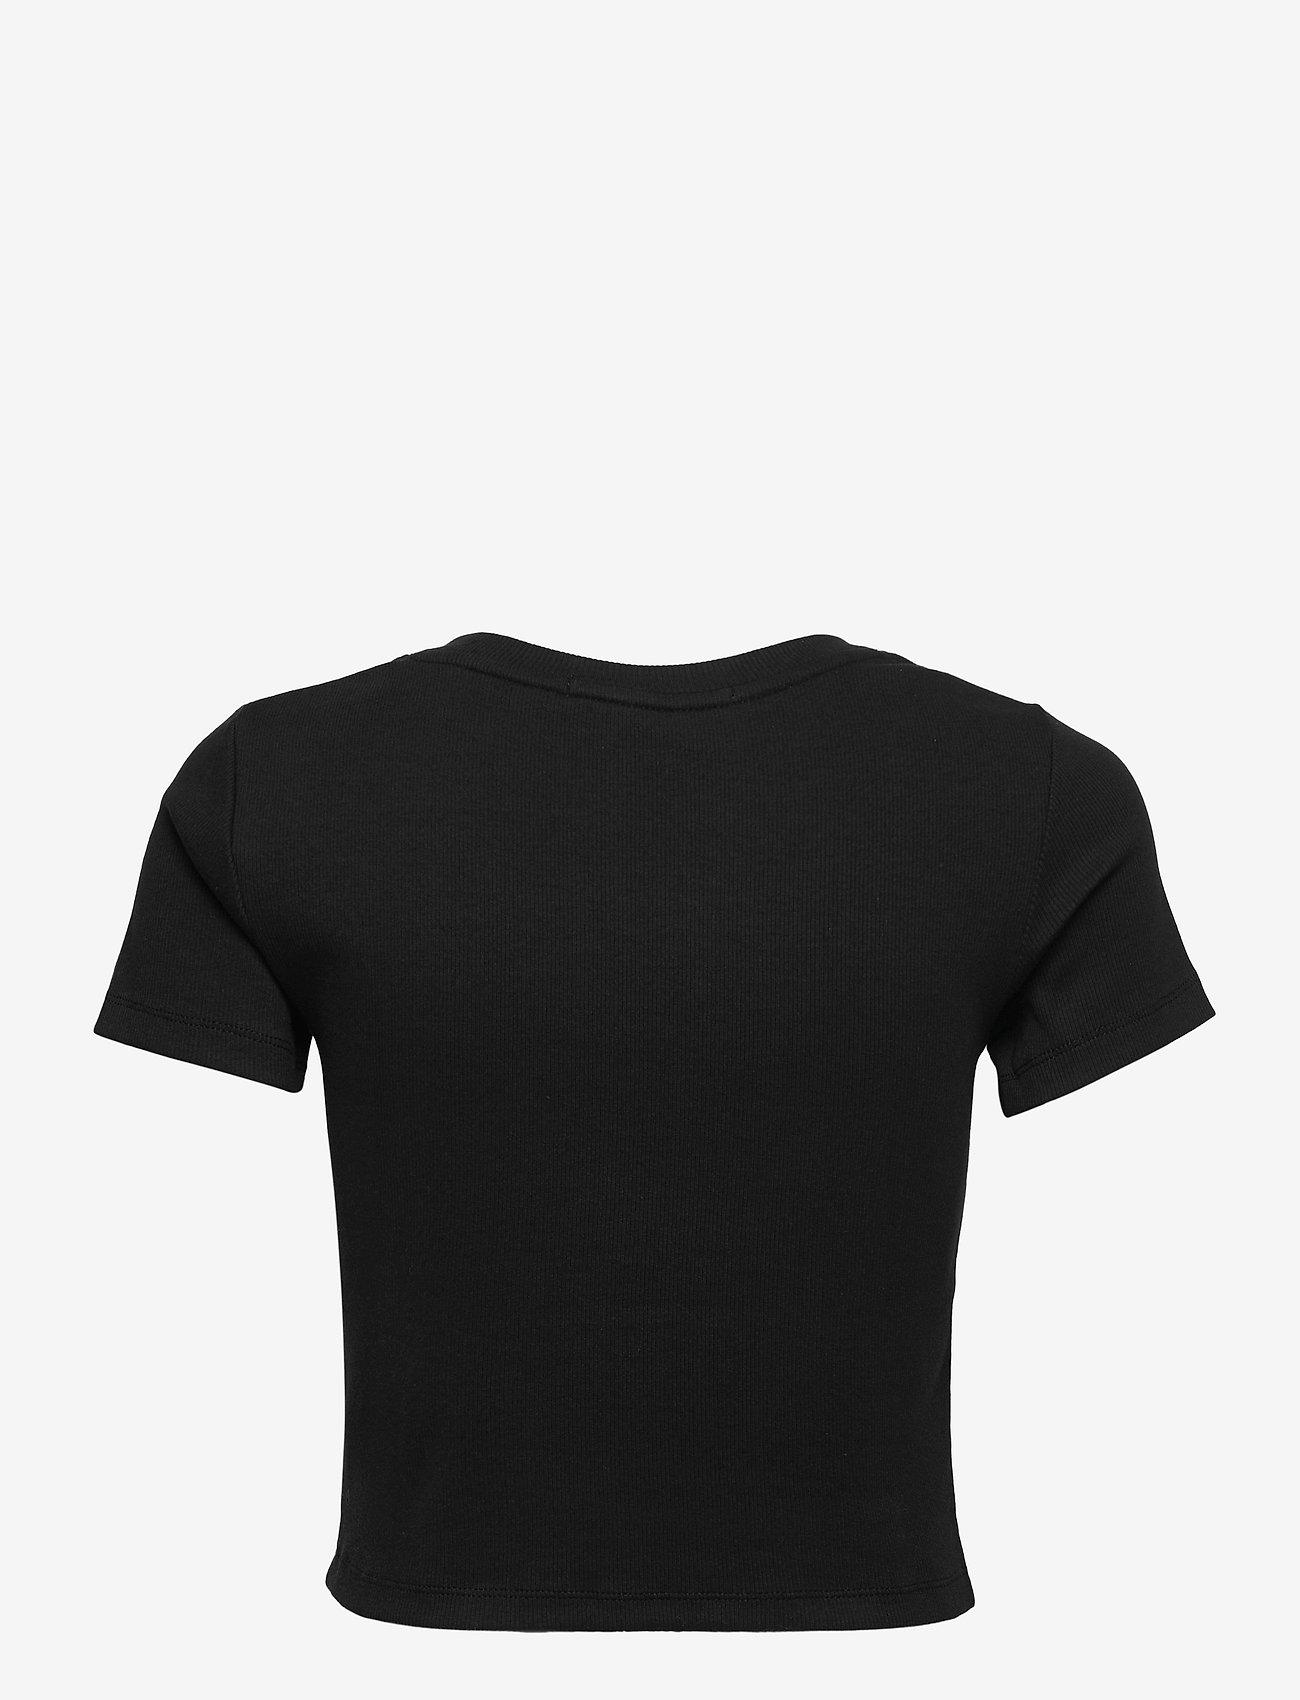 Calvin Klein Jeans - MICRO BRANDING CROP RIB TOP - crop tops - ck black - 1